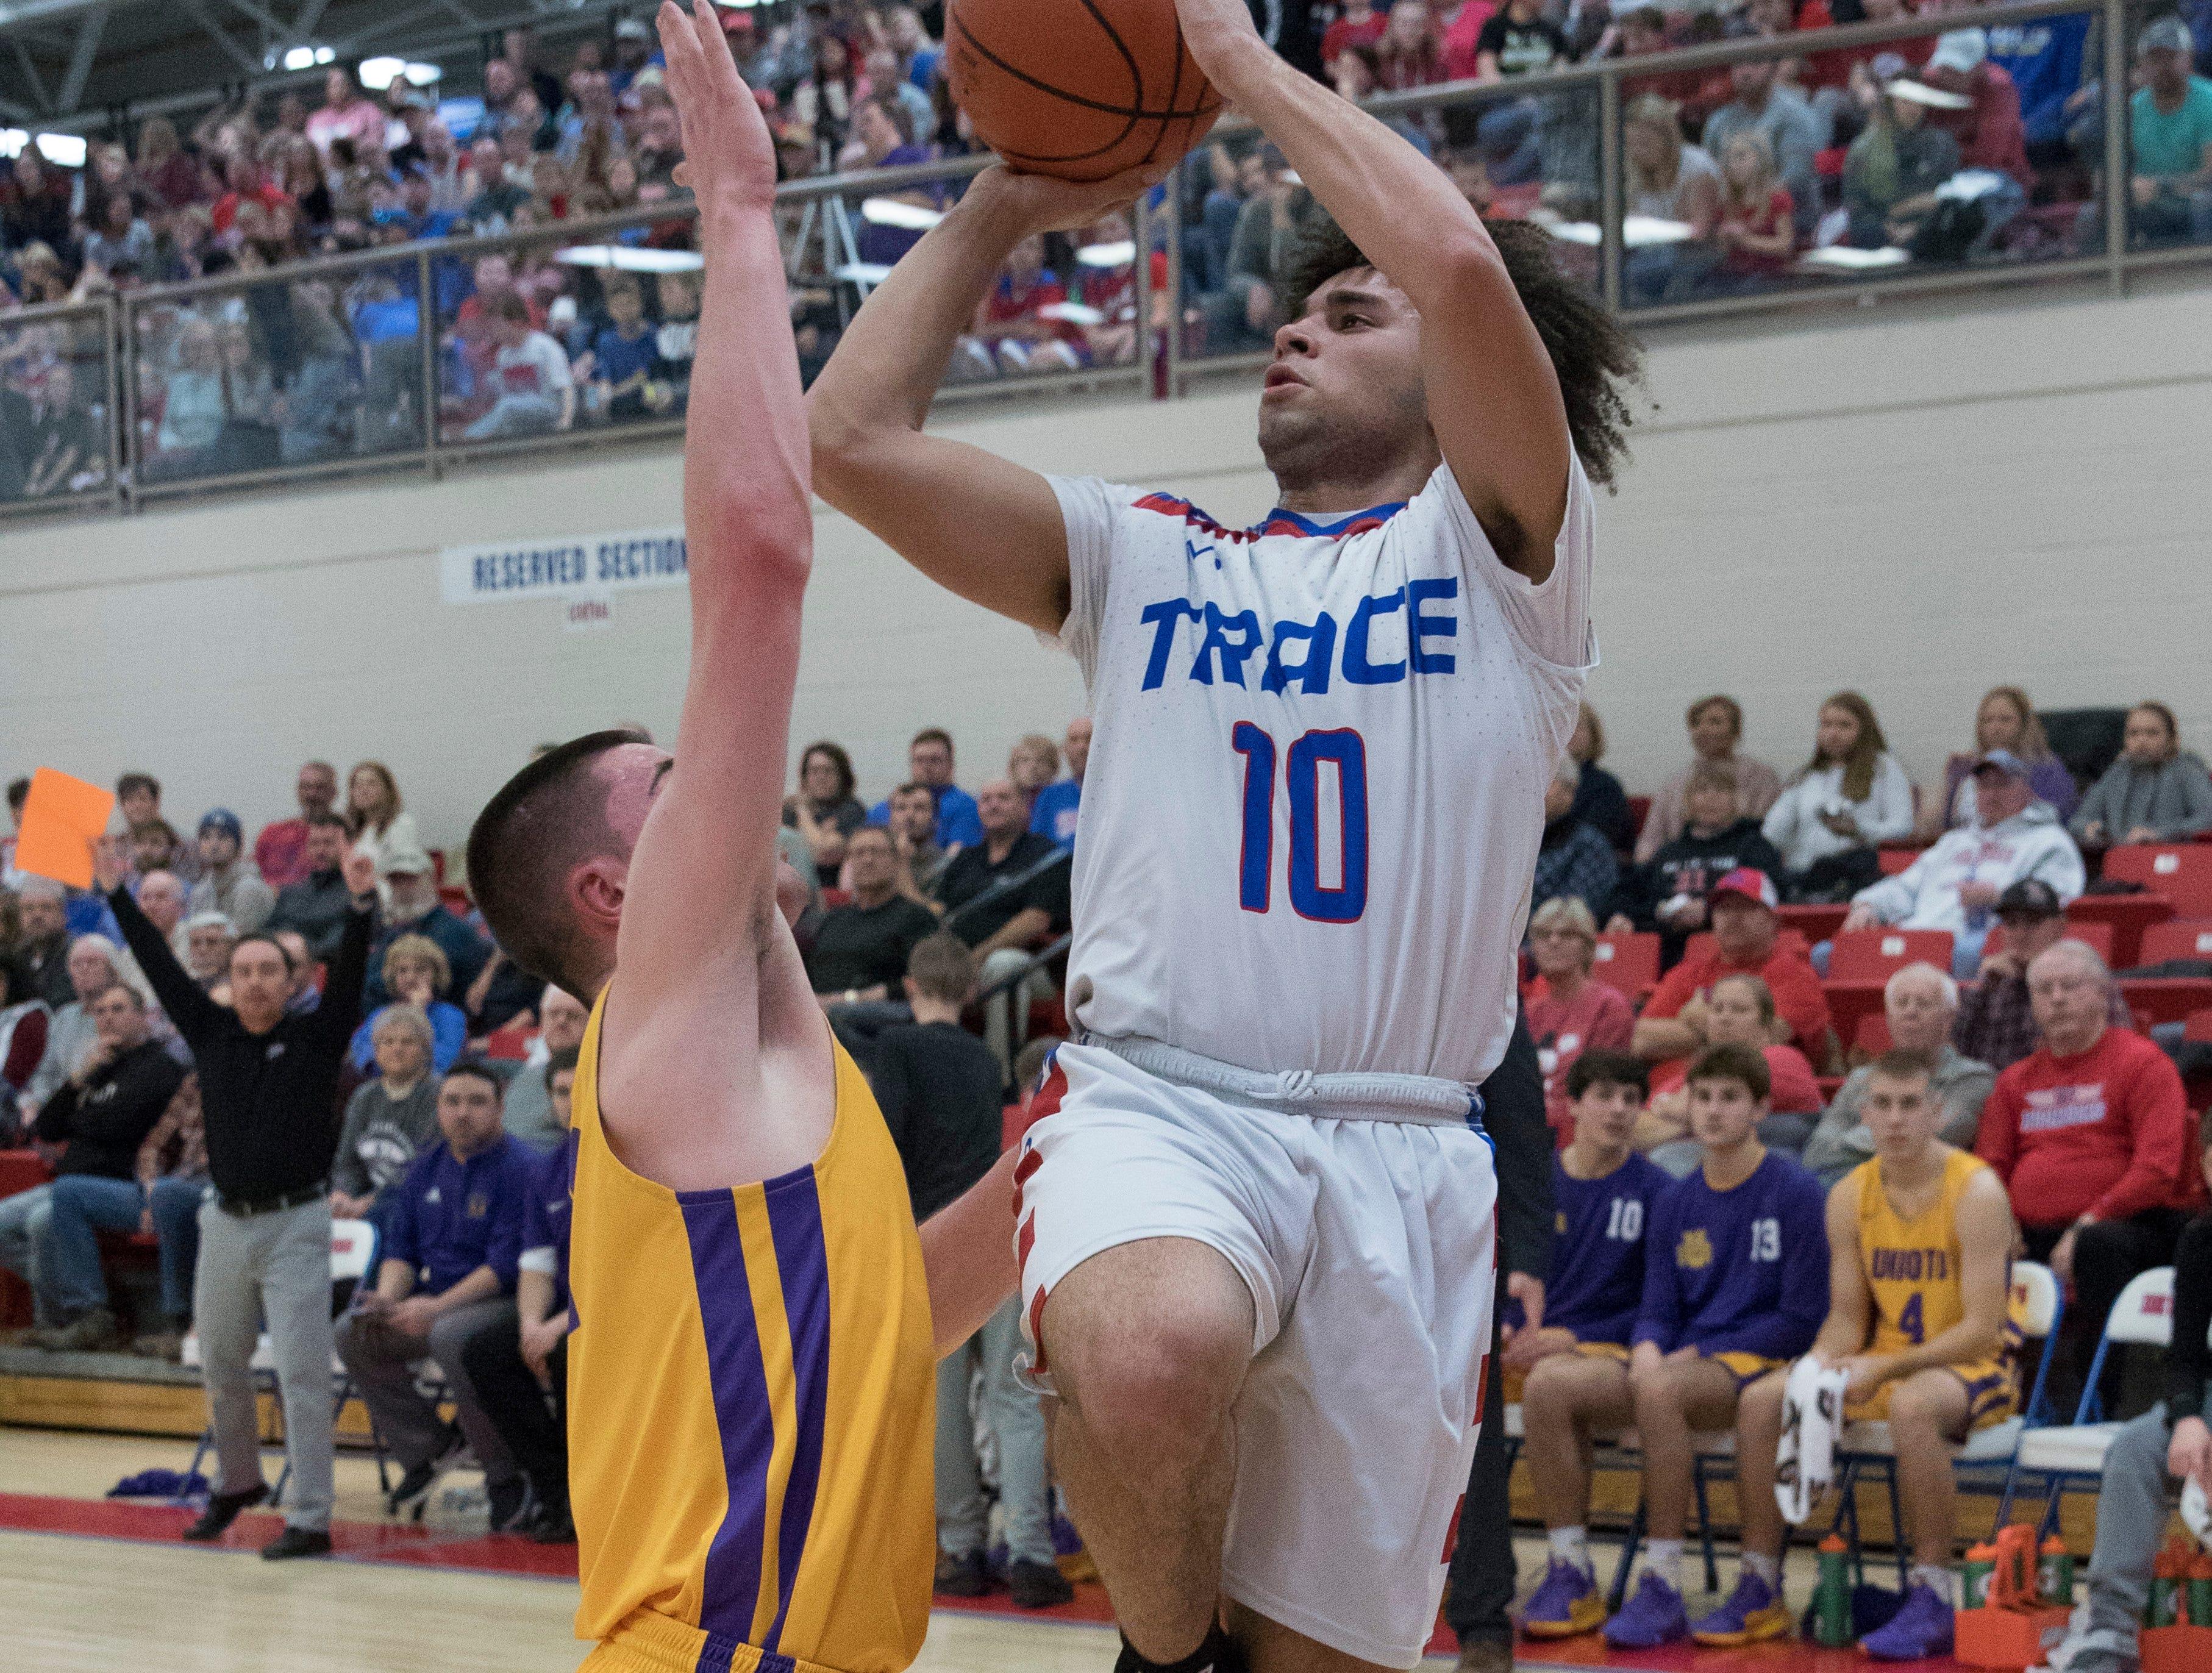 Zane Trace defeated Unioto Friday night 46-35 at Zane Trace High School.